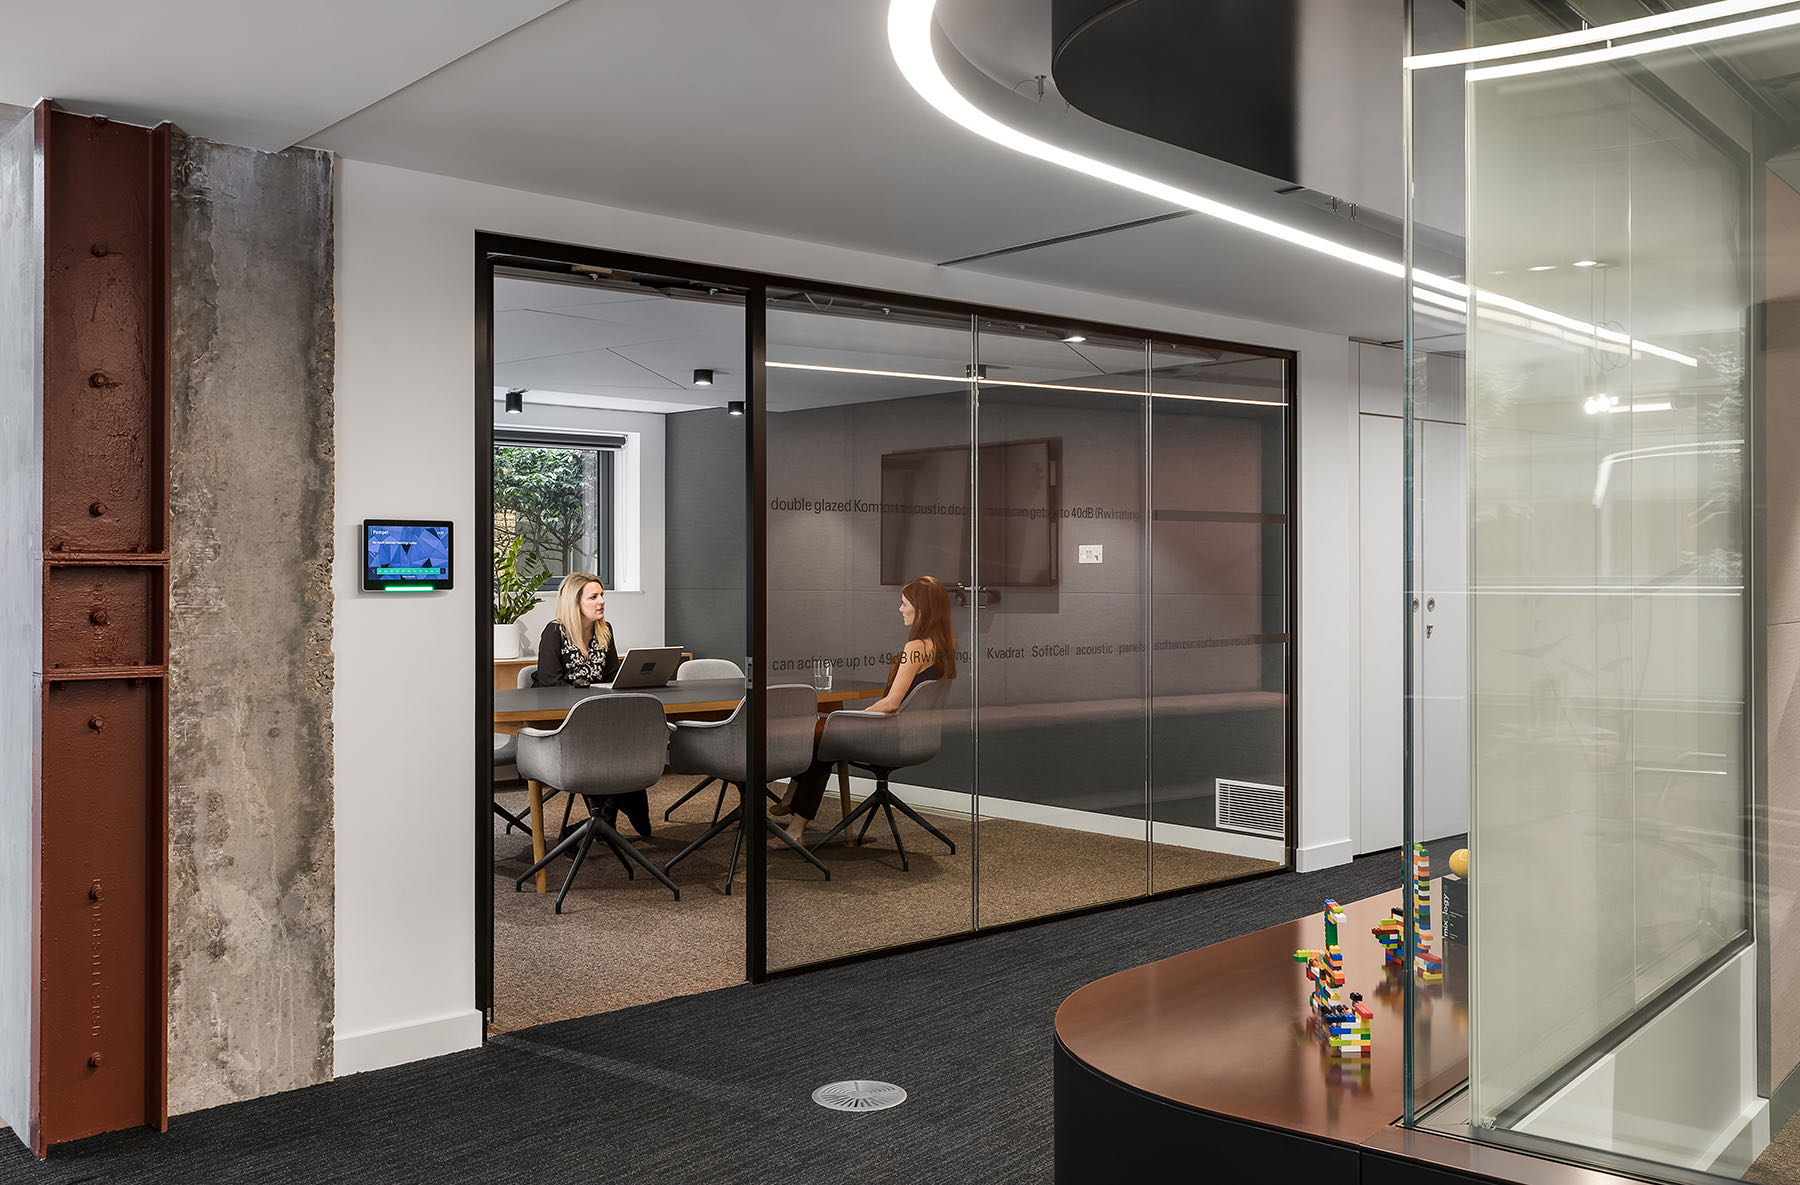 oktra-london-office-4